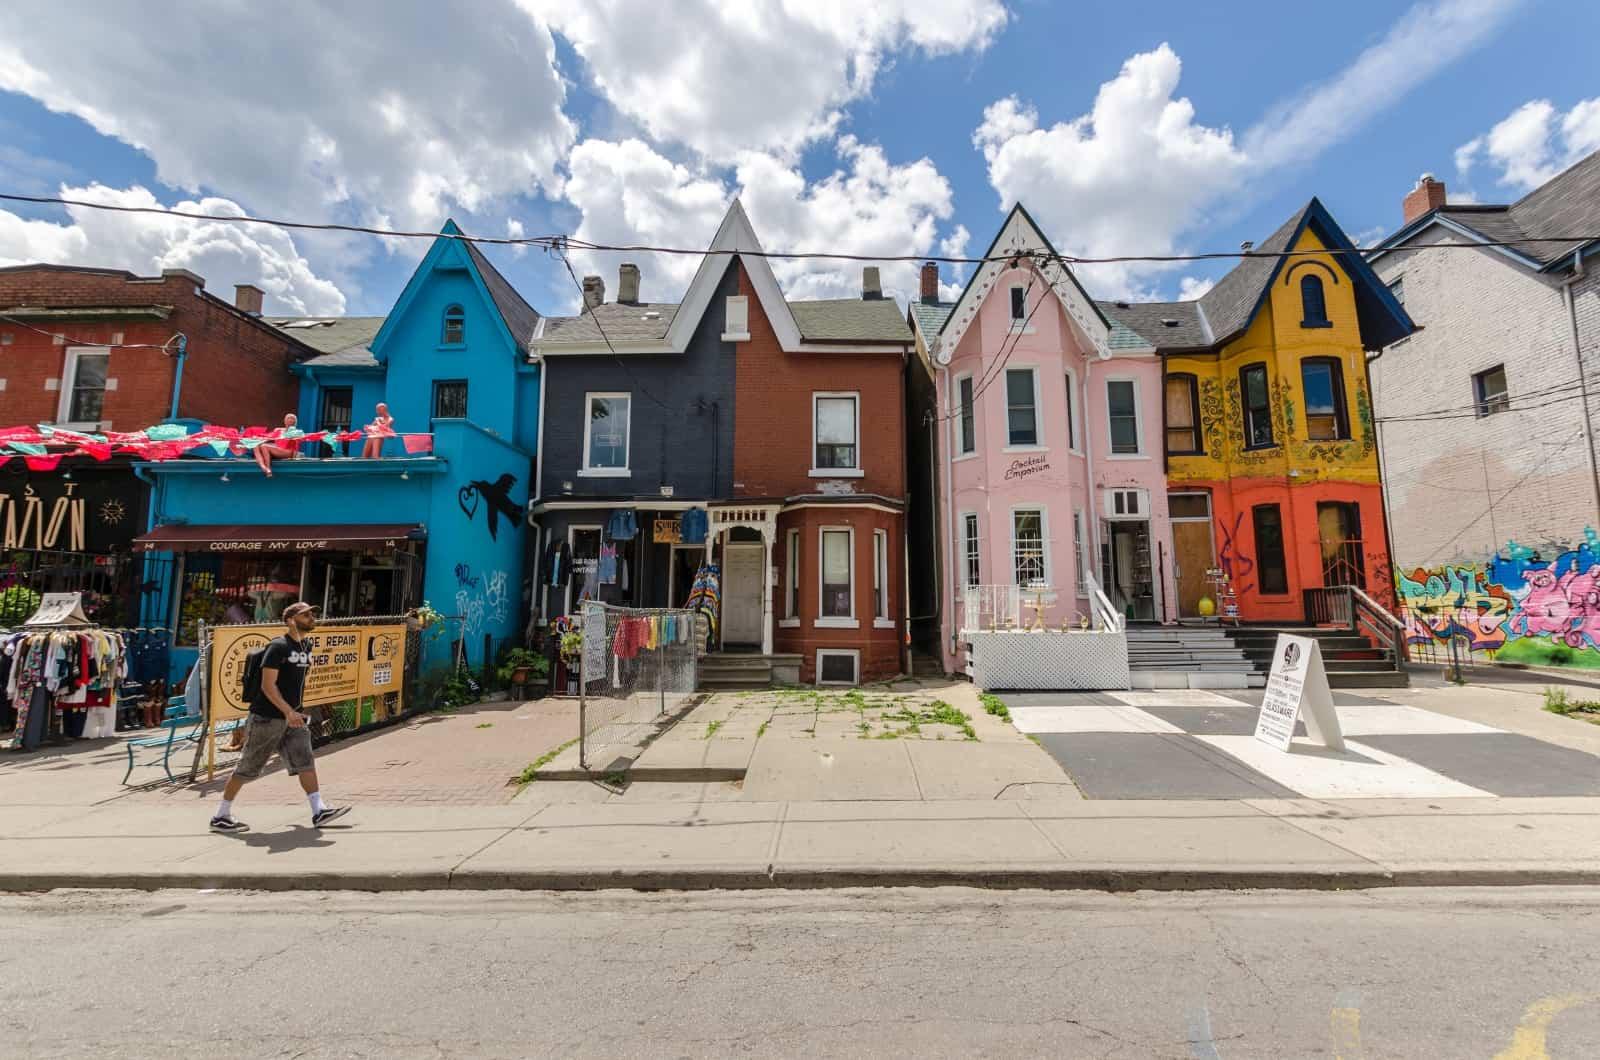 Kensington Avenue und Kensigton Market in Toronto. Foto Mbruxelle